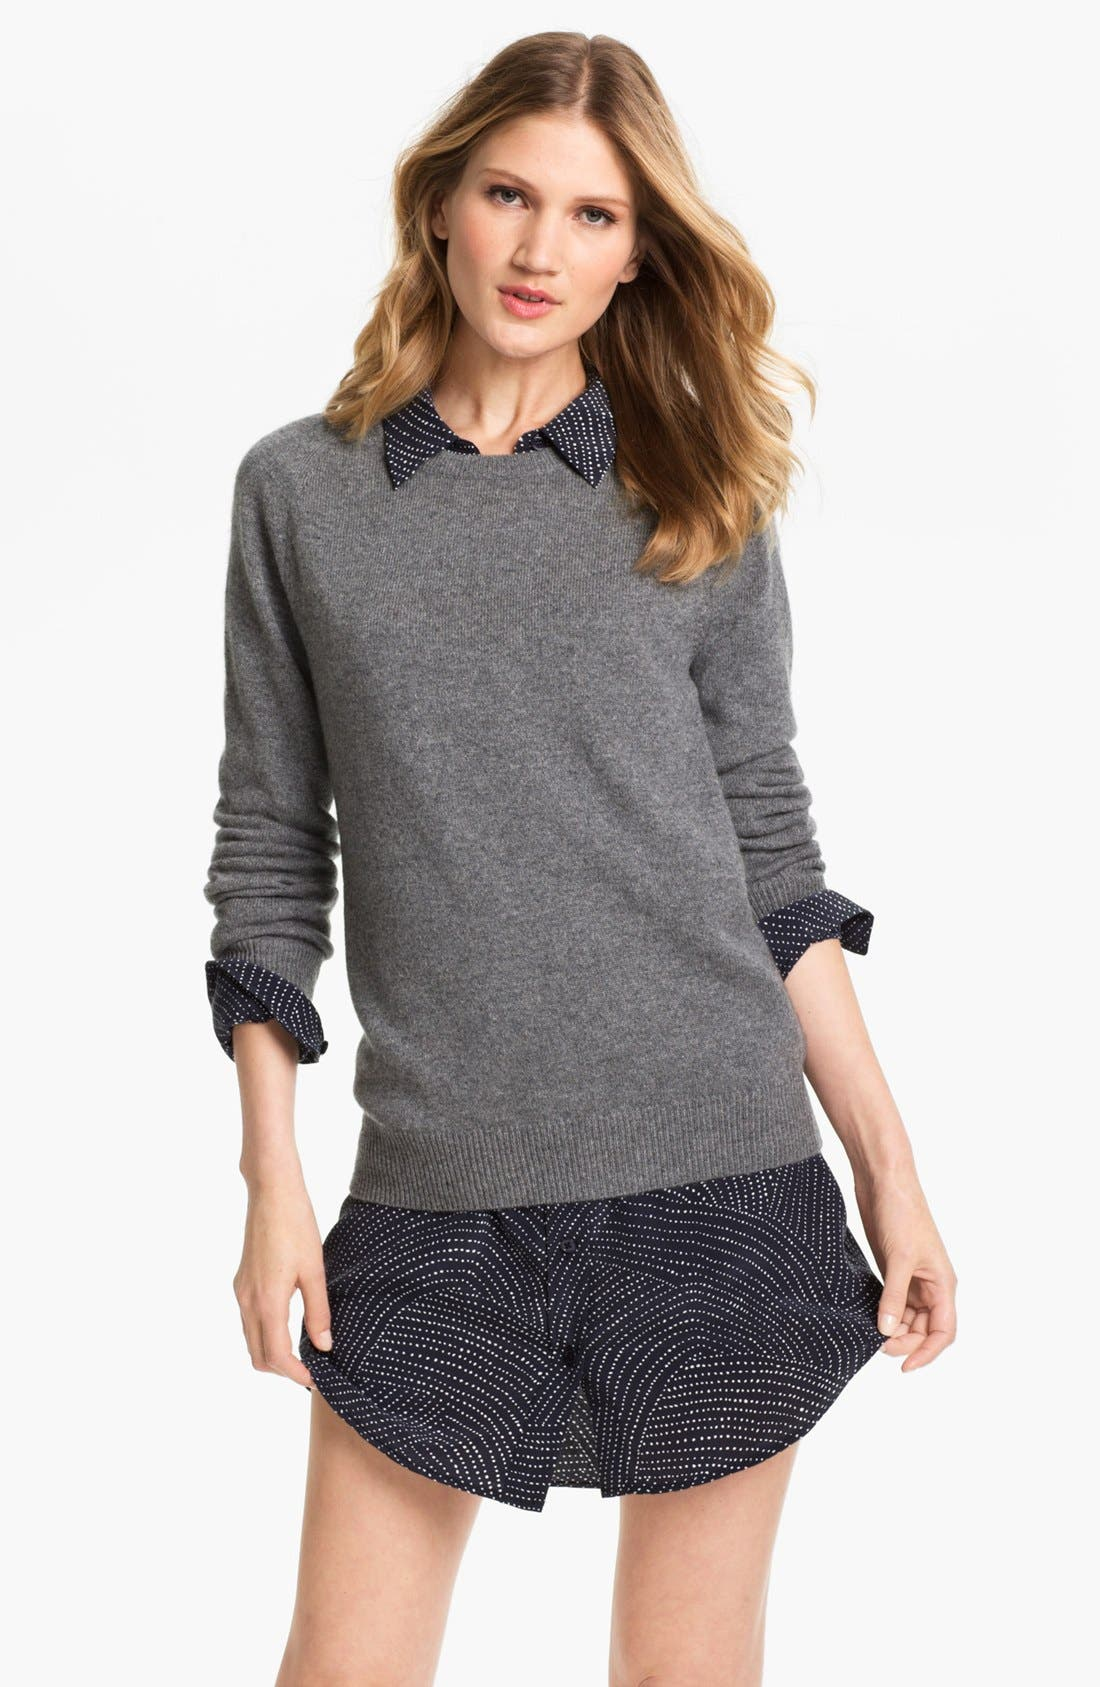 EQUIPMENT, 'Sloane' Crewneck Cashmere Sweater, Main thumbnail 1, color, 021